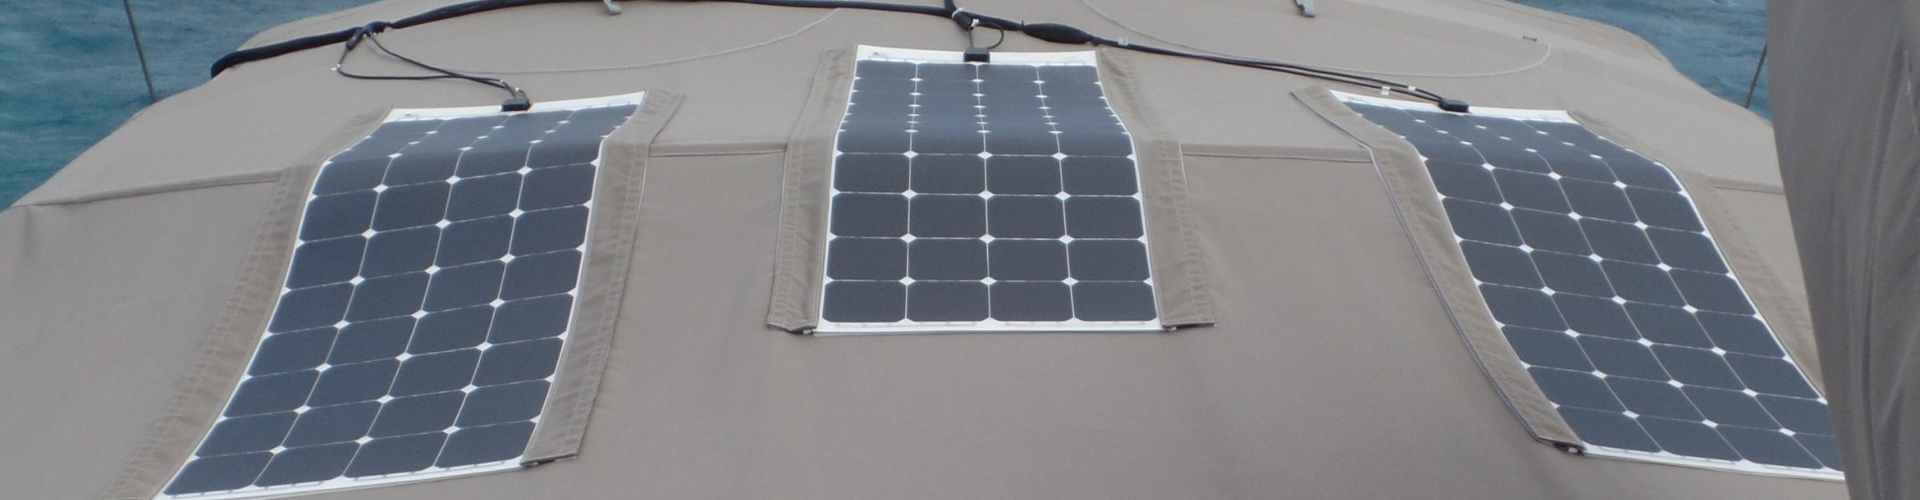 solar panel for marine